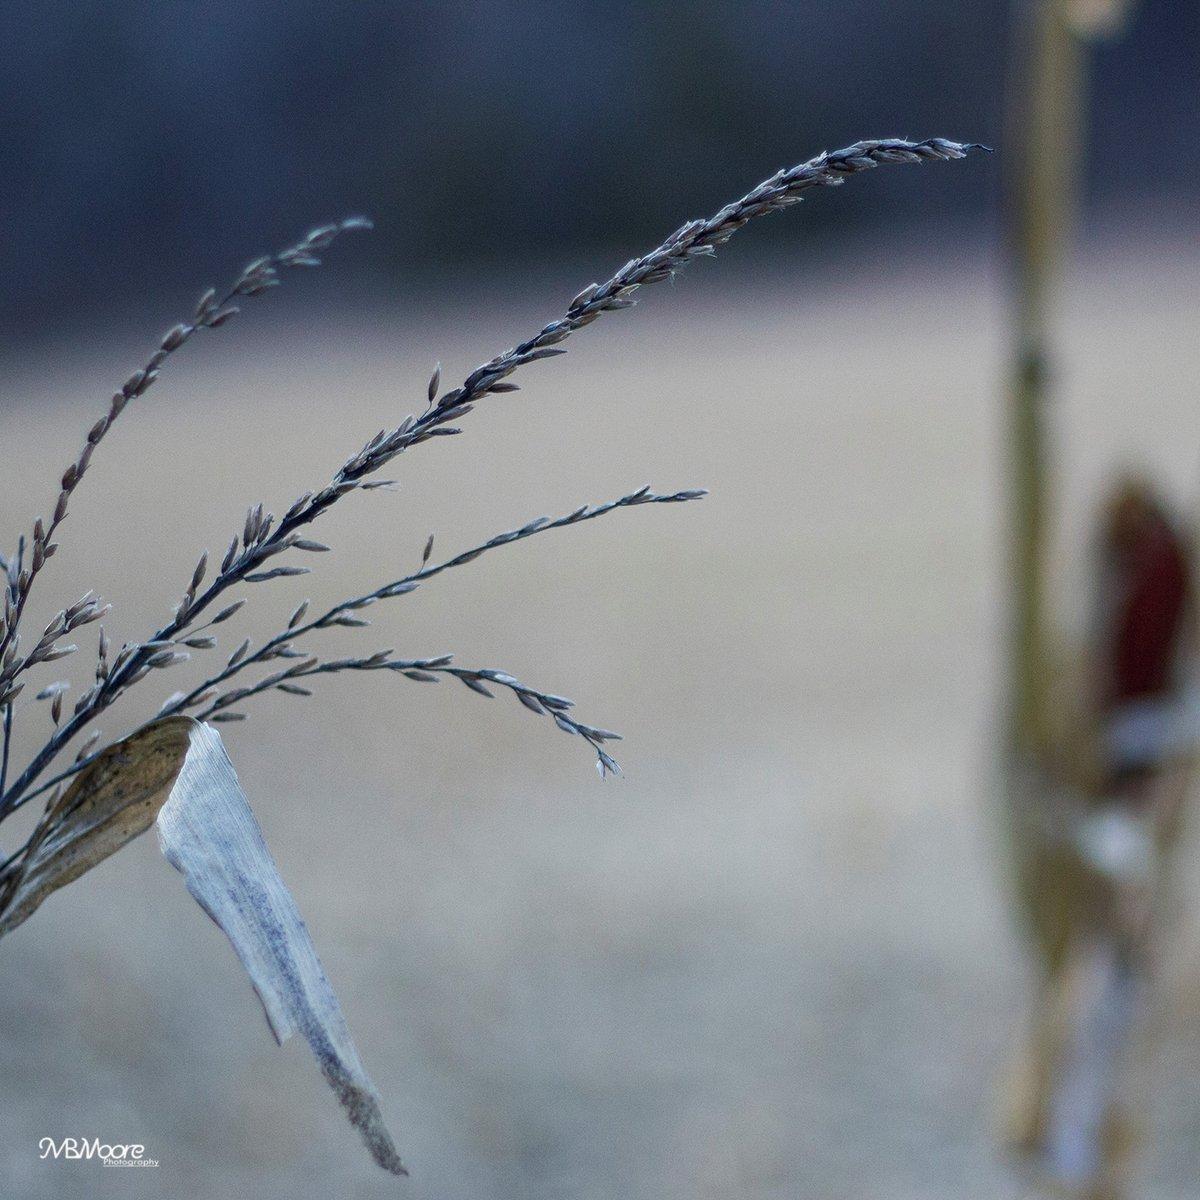 Grain: Wild and Domestic - Loess Hills, Iowa. November 18, 2020.   #Photography #Farm #Rustic #Iowa #Autumn #November #Mood #Outdoors #Rural #Americana  Patreon: https://t.co/B3sFUKhOiw https://t.co/iPnj2i3zPP